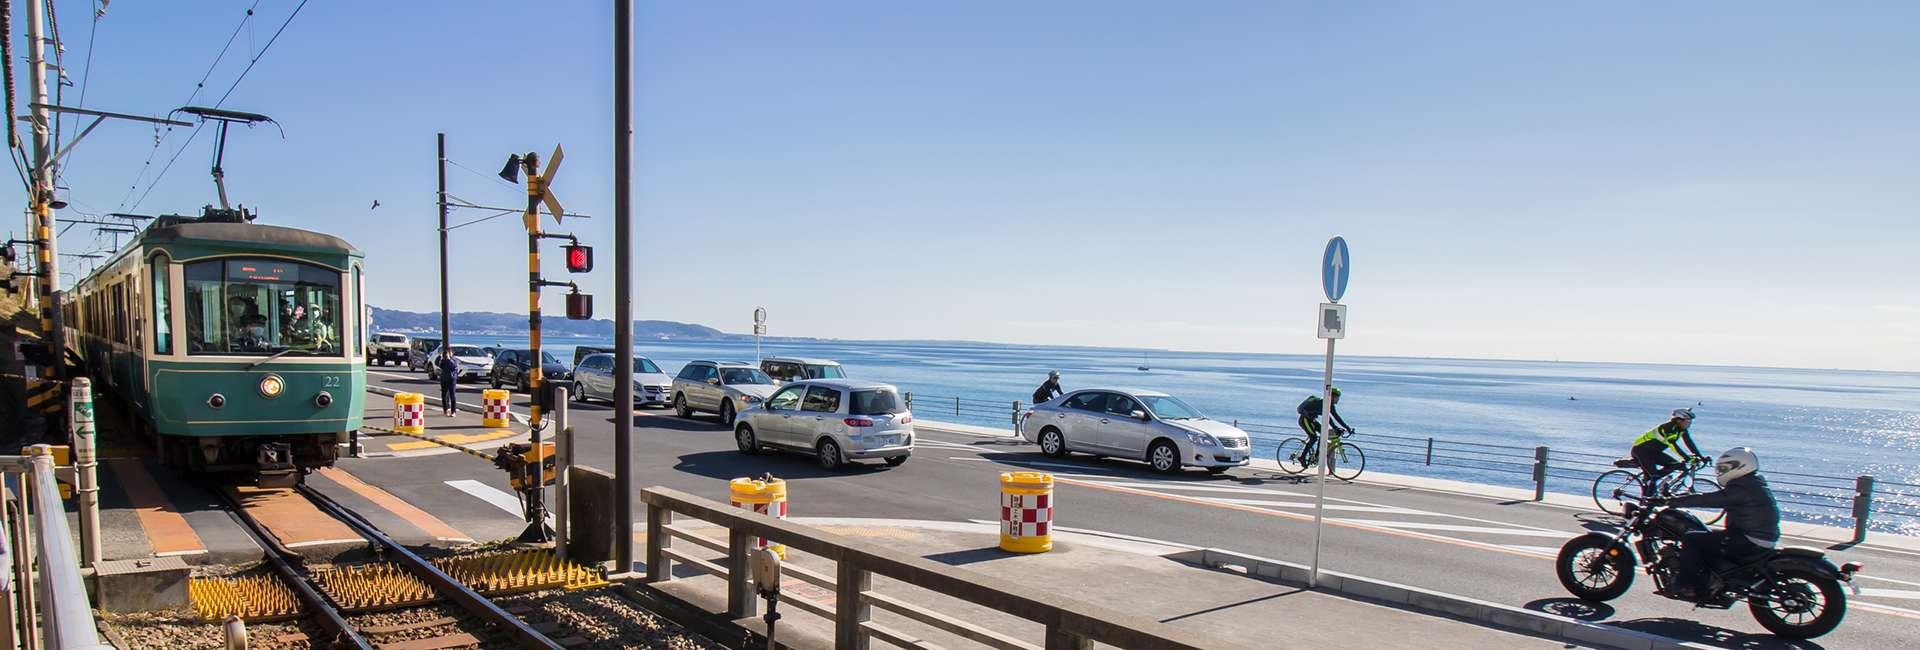 bord de mer et train à Kamakura